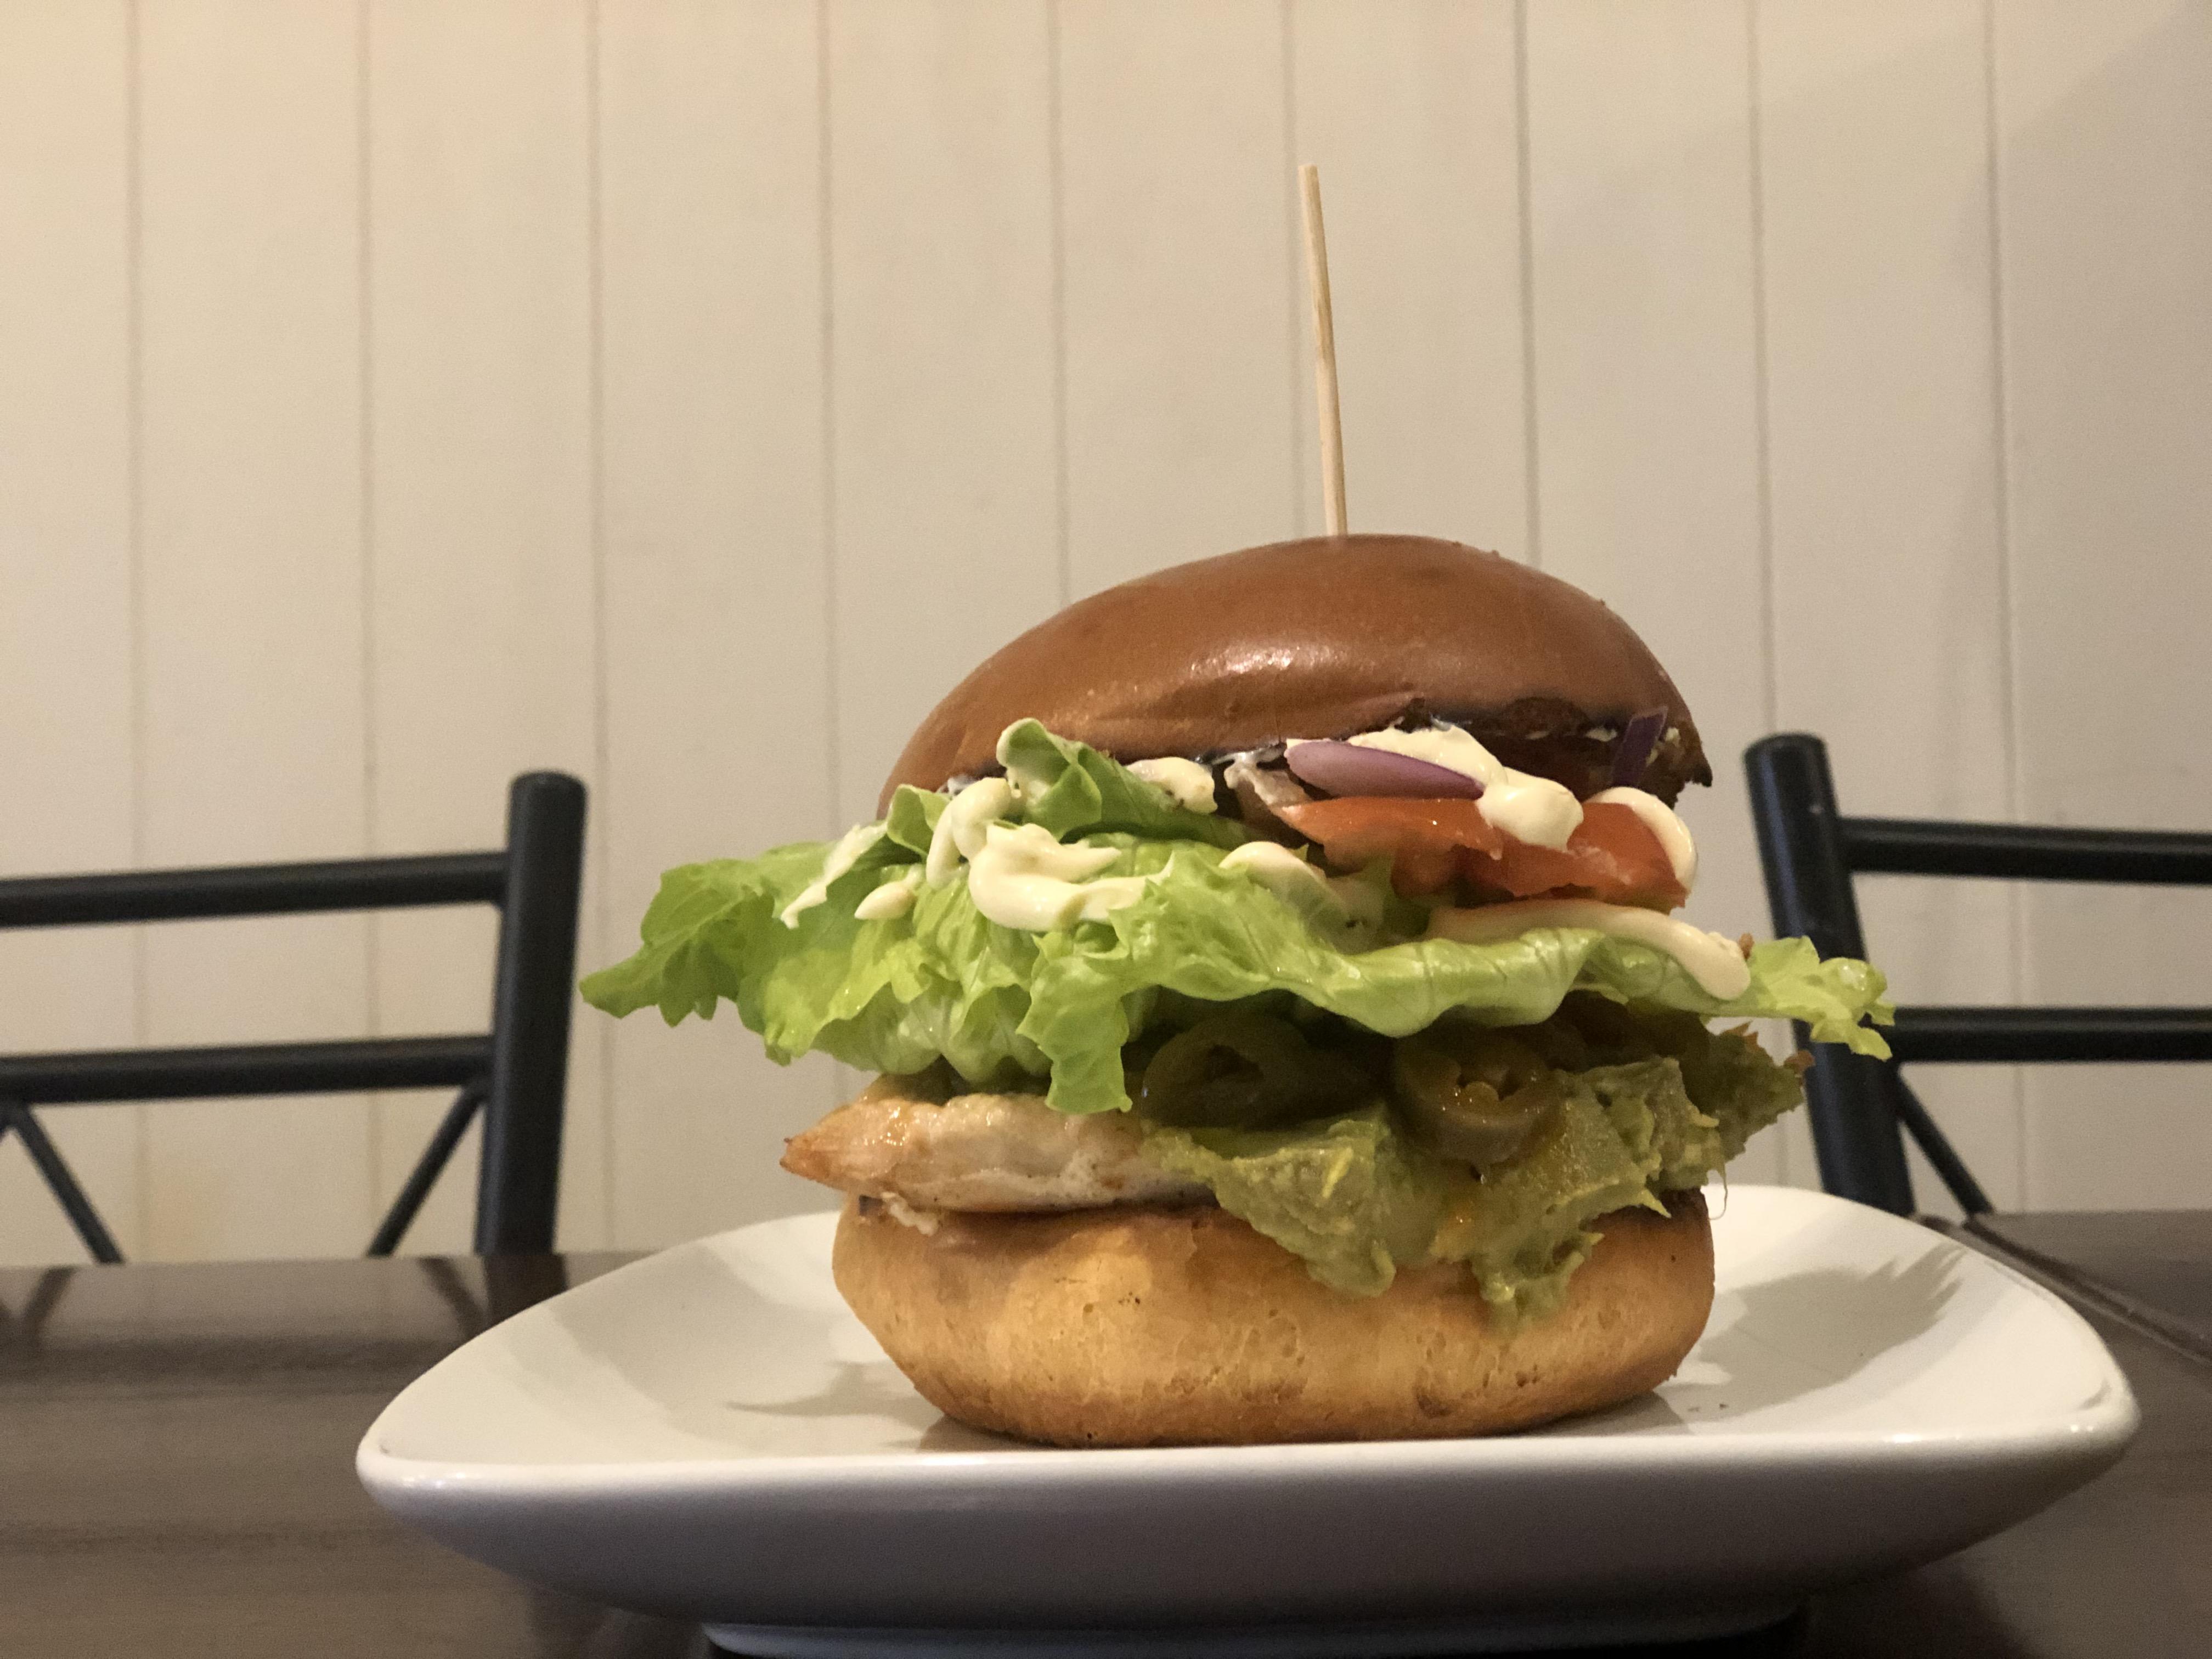 Fresh Tasty Burgers